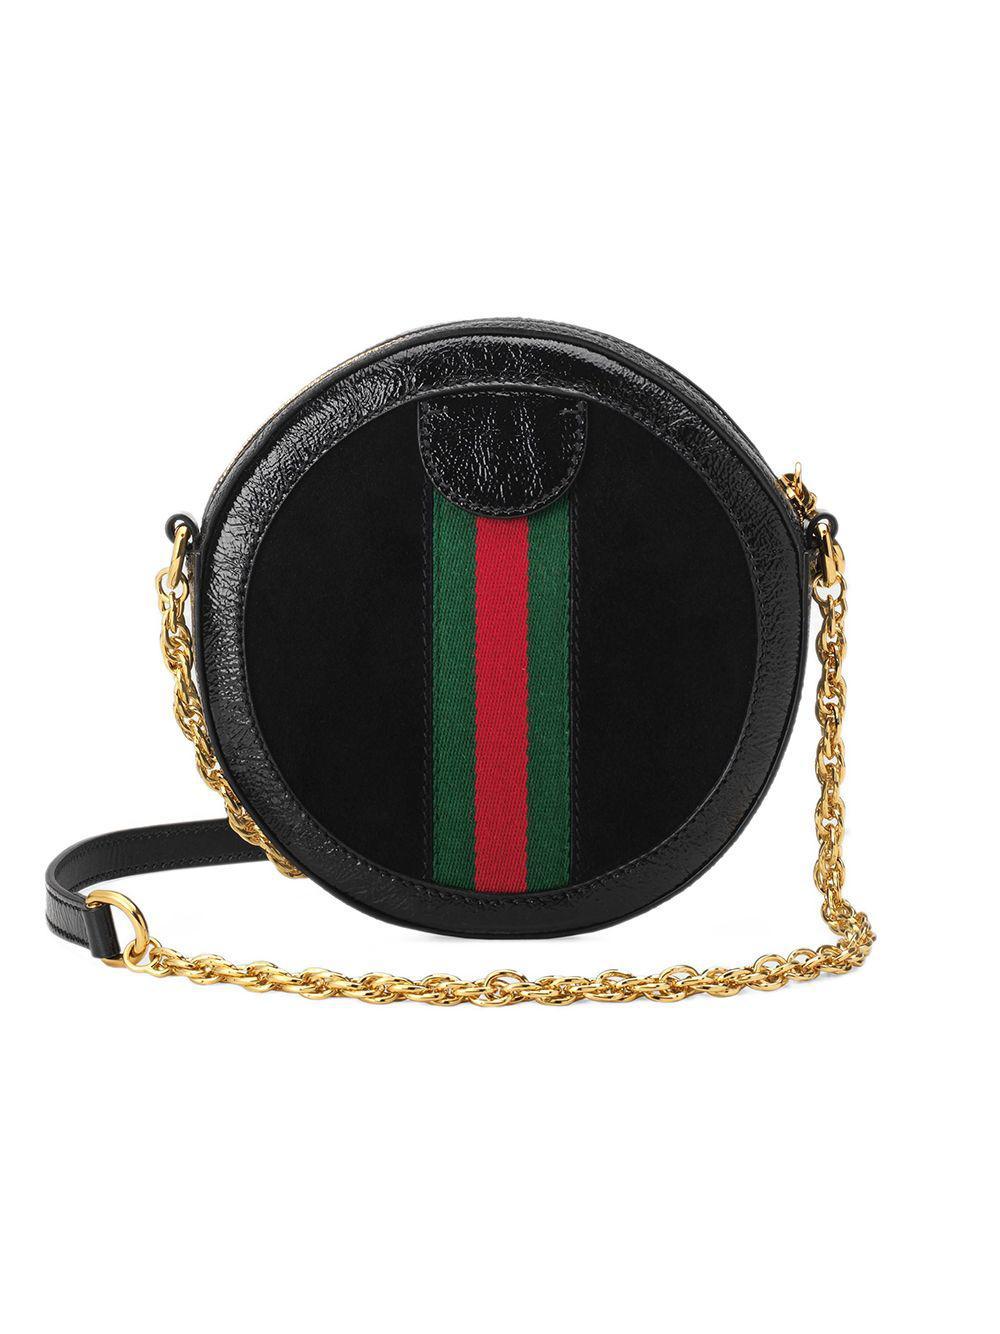 c78afd11df16 Gucci Ophidia Mini Round Shoulder Bag in Black - Lyst